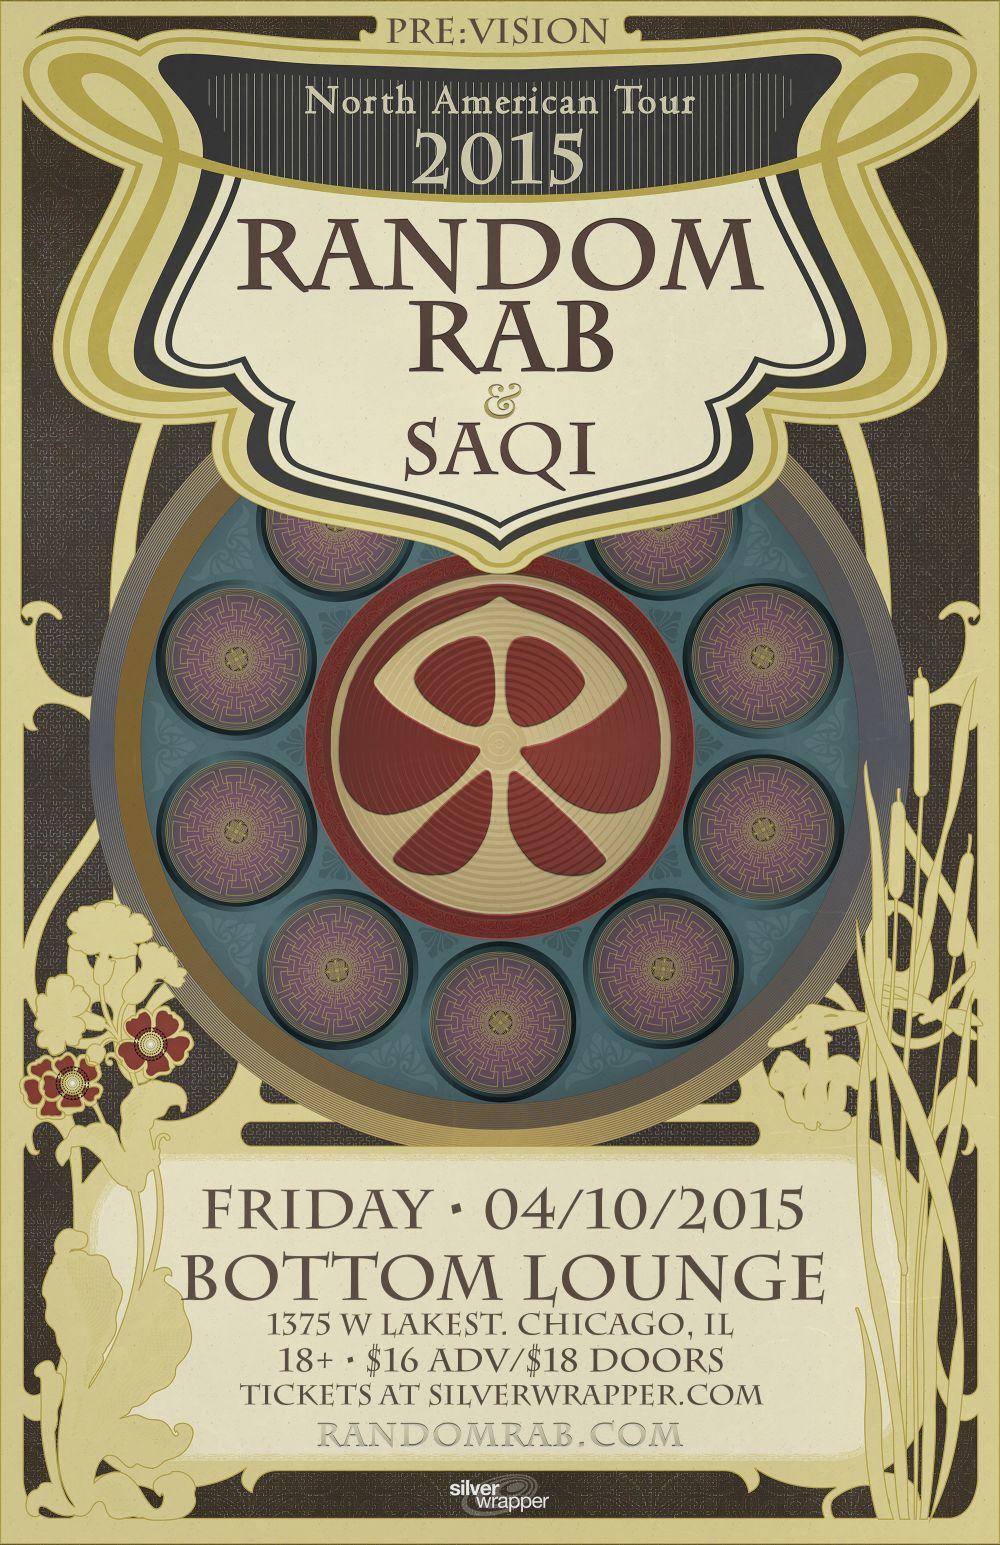 Random Rab Saqi Upstairs Bottom Lounge Chicago